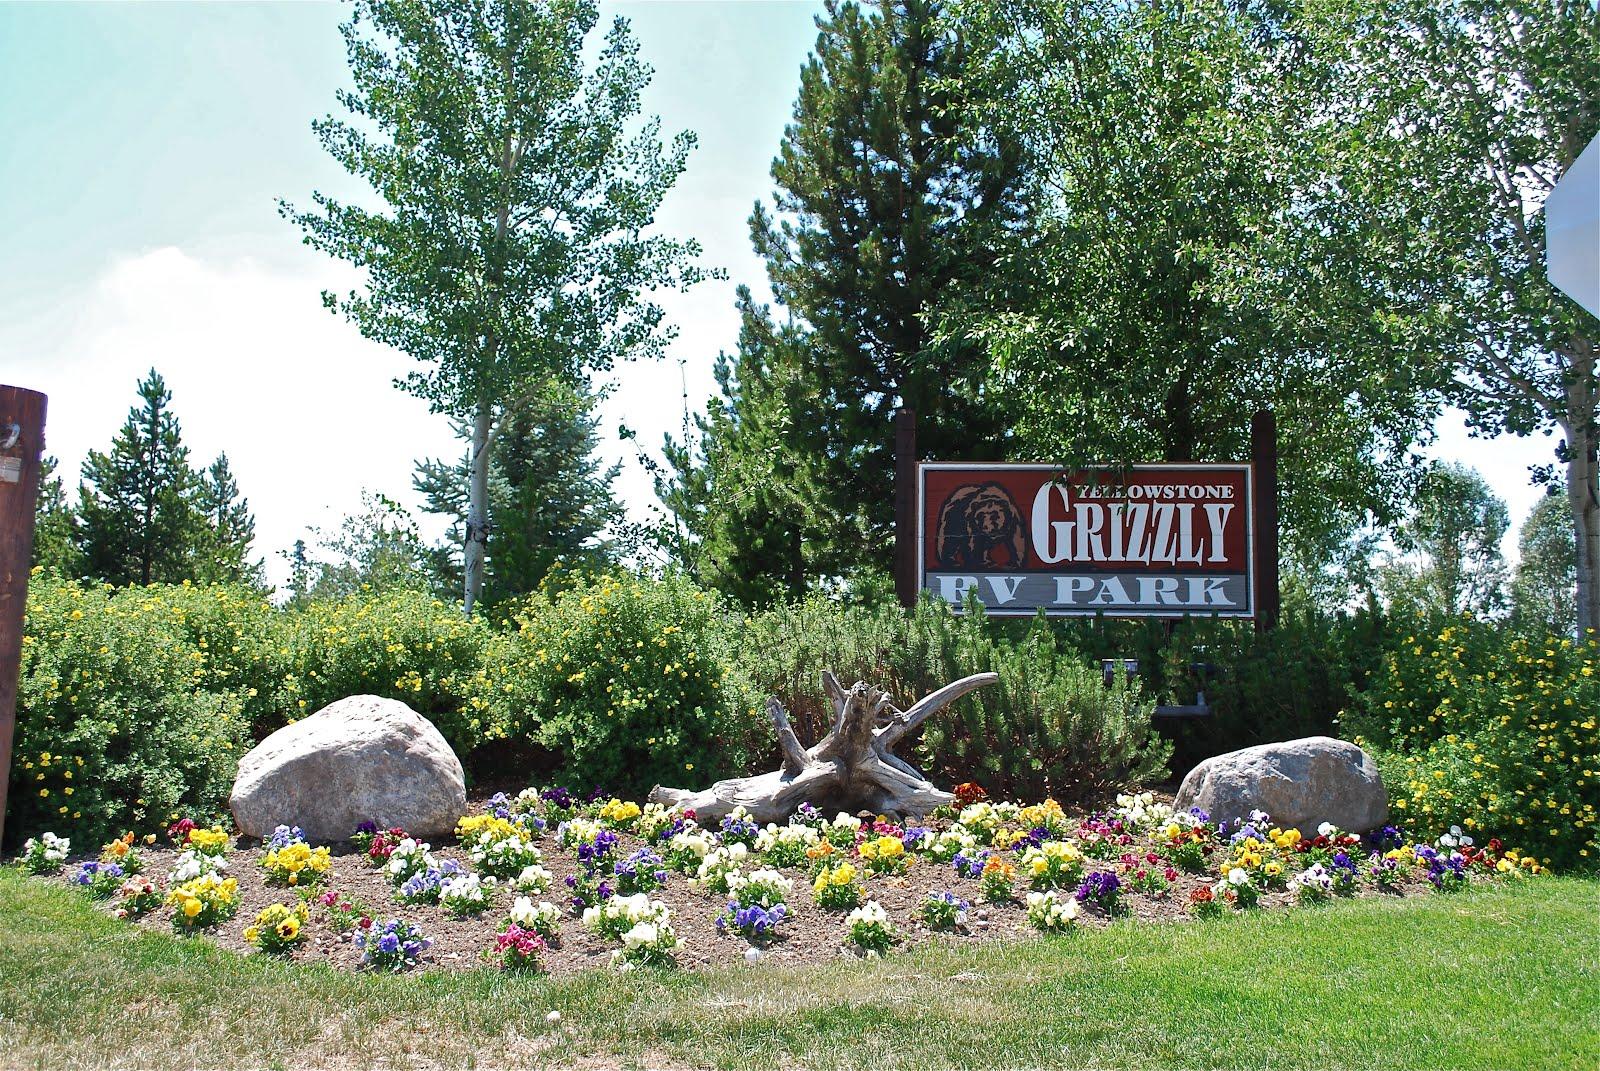 Blue Sky Ahead Yellowstone Grizzly Rv Park